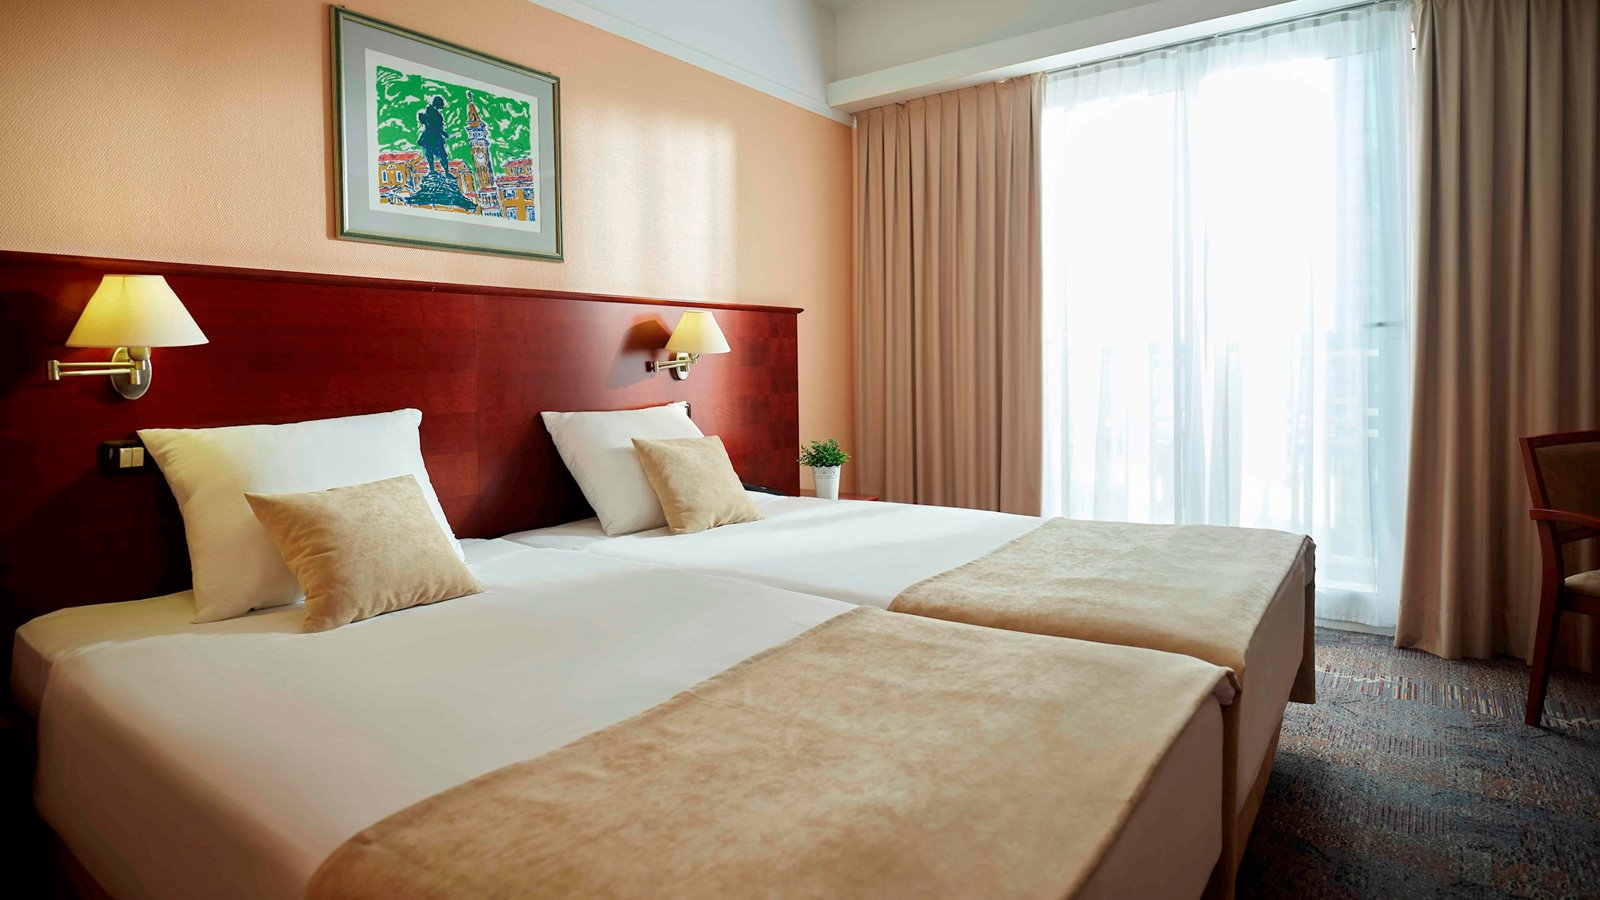 grand-hotel-portoroz-old-double-room-park-view-2019-web